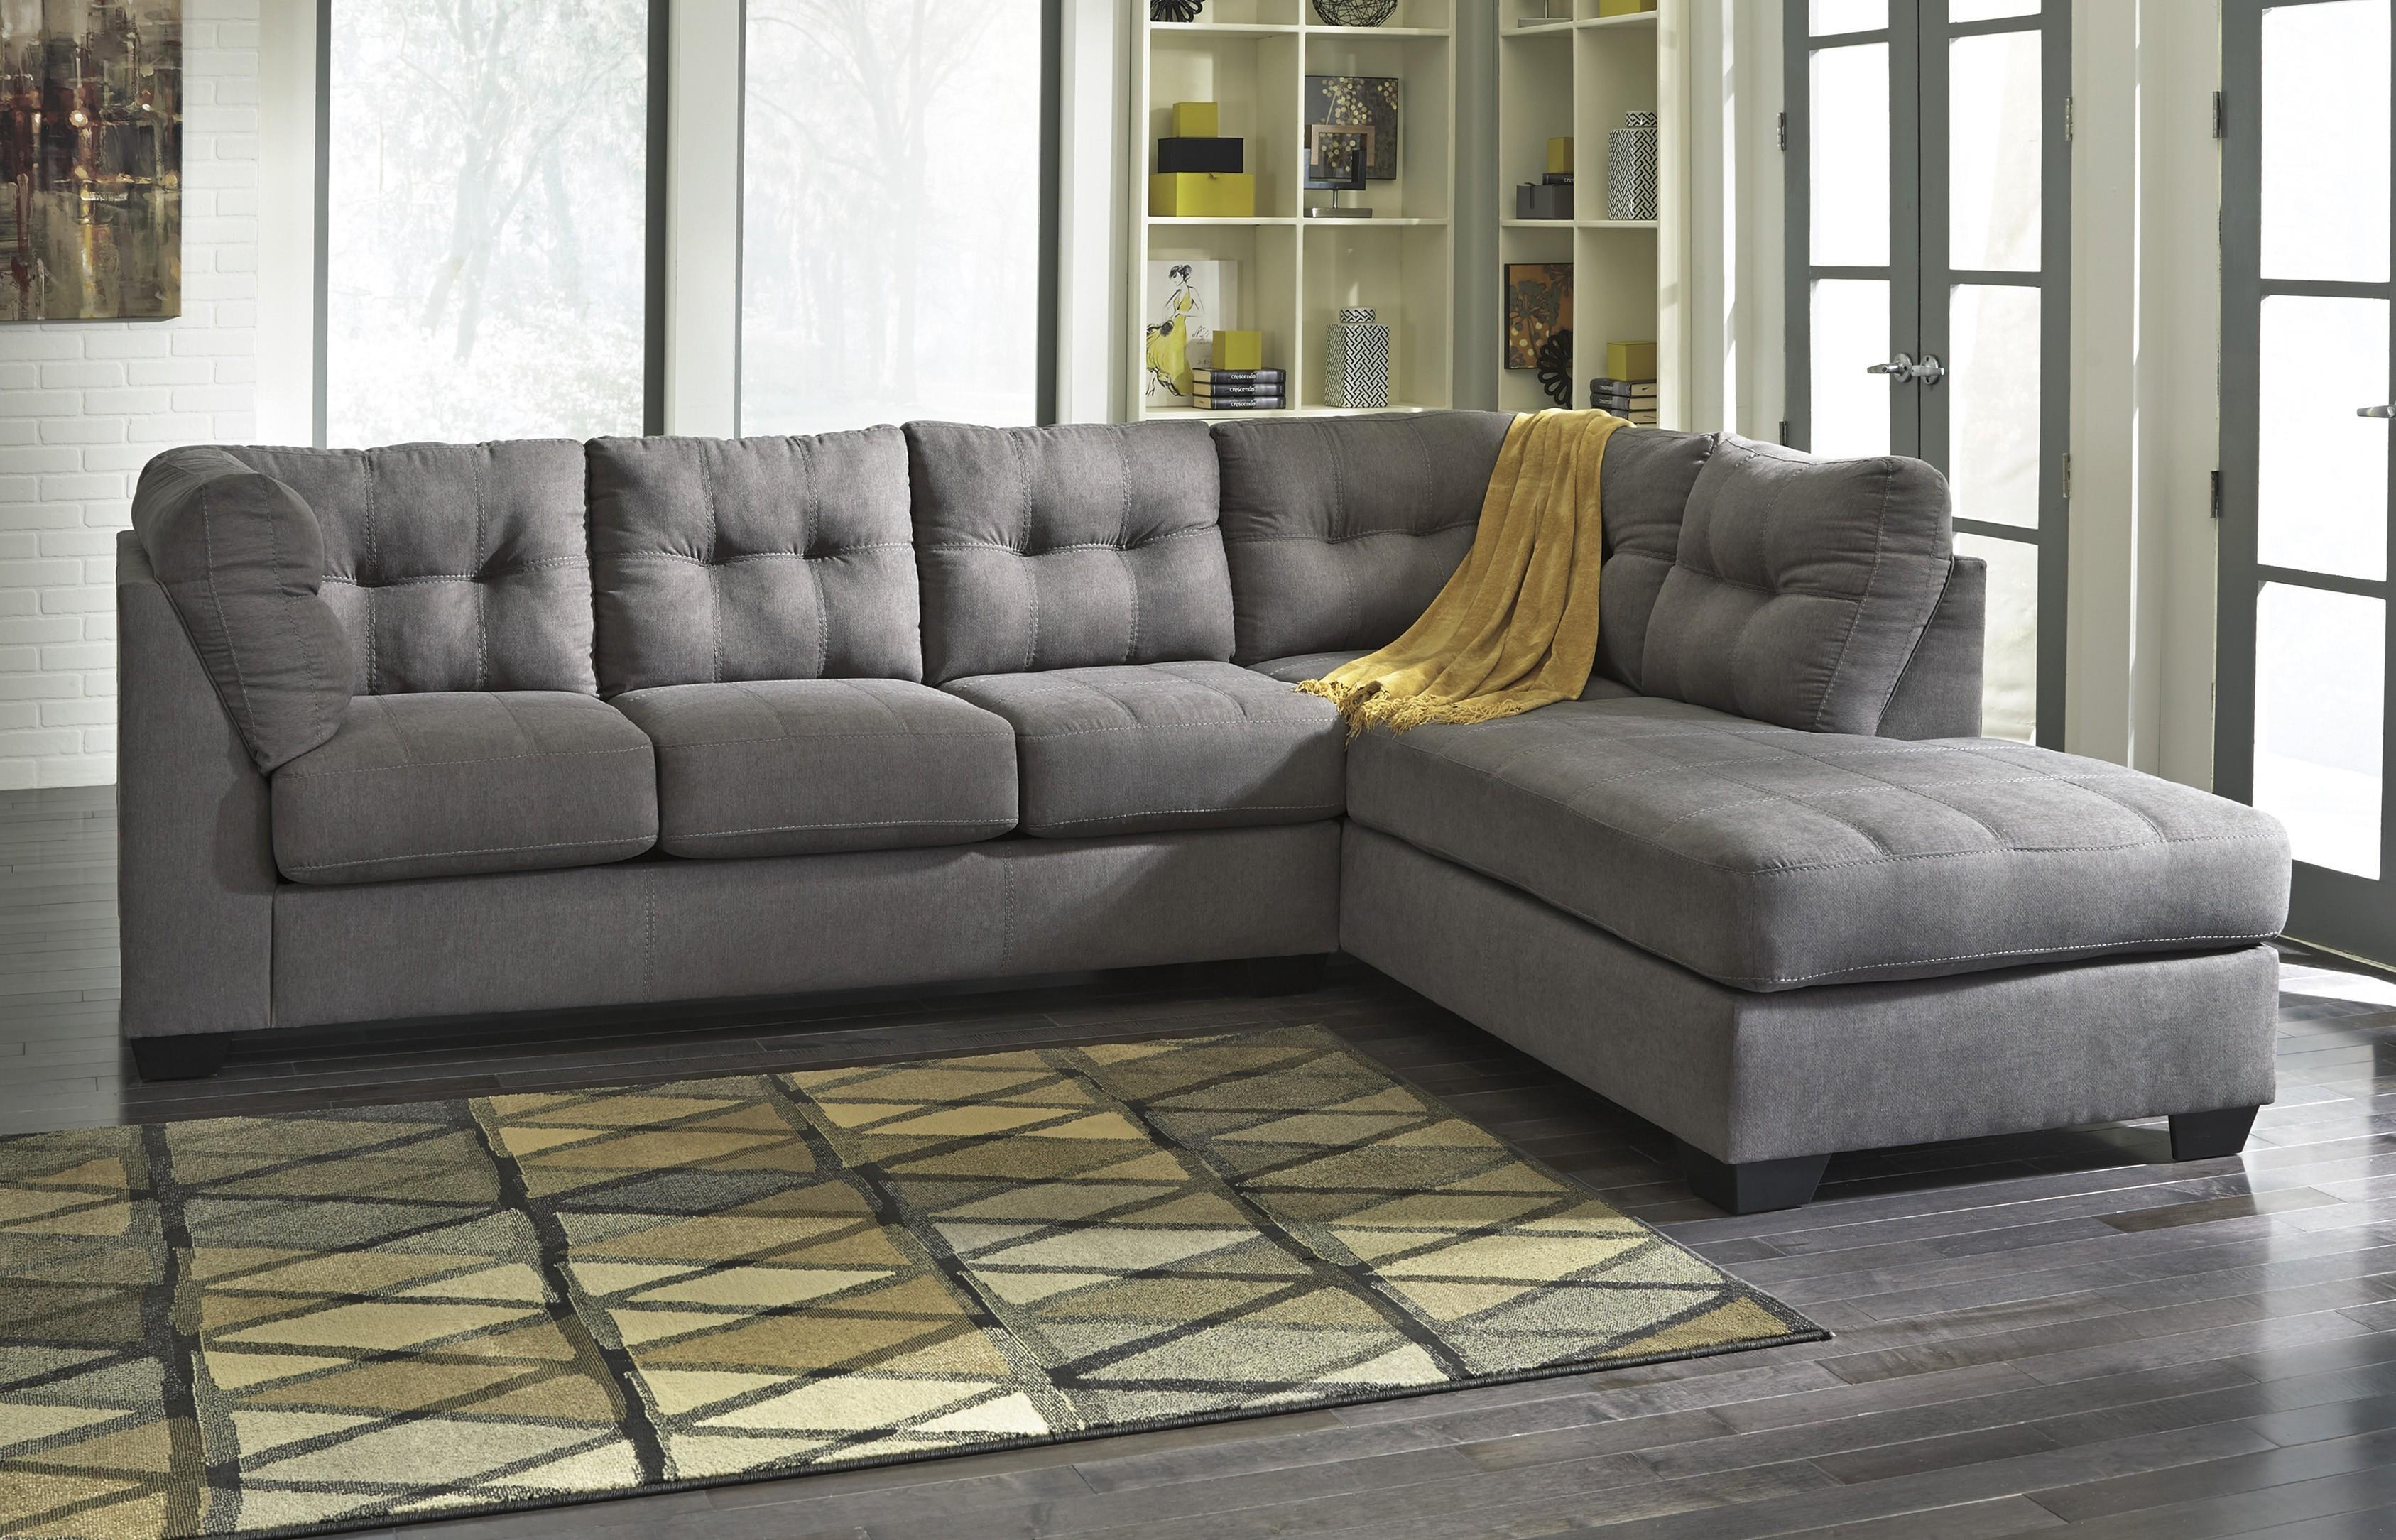 Sofas Center : Ashley Furniture Tufted Sofa Leather Sofaashley In Ashley Tufted Sofa (View 6 of 20)